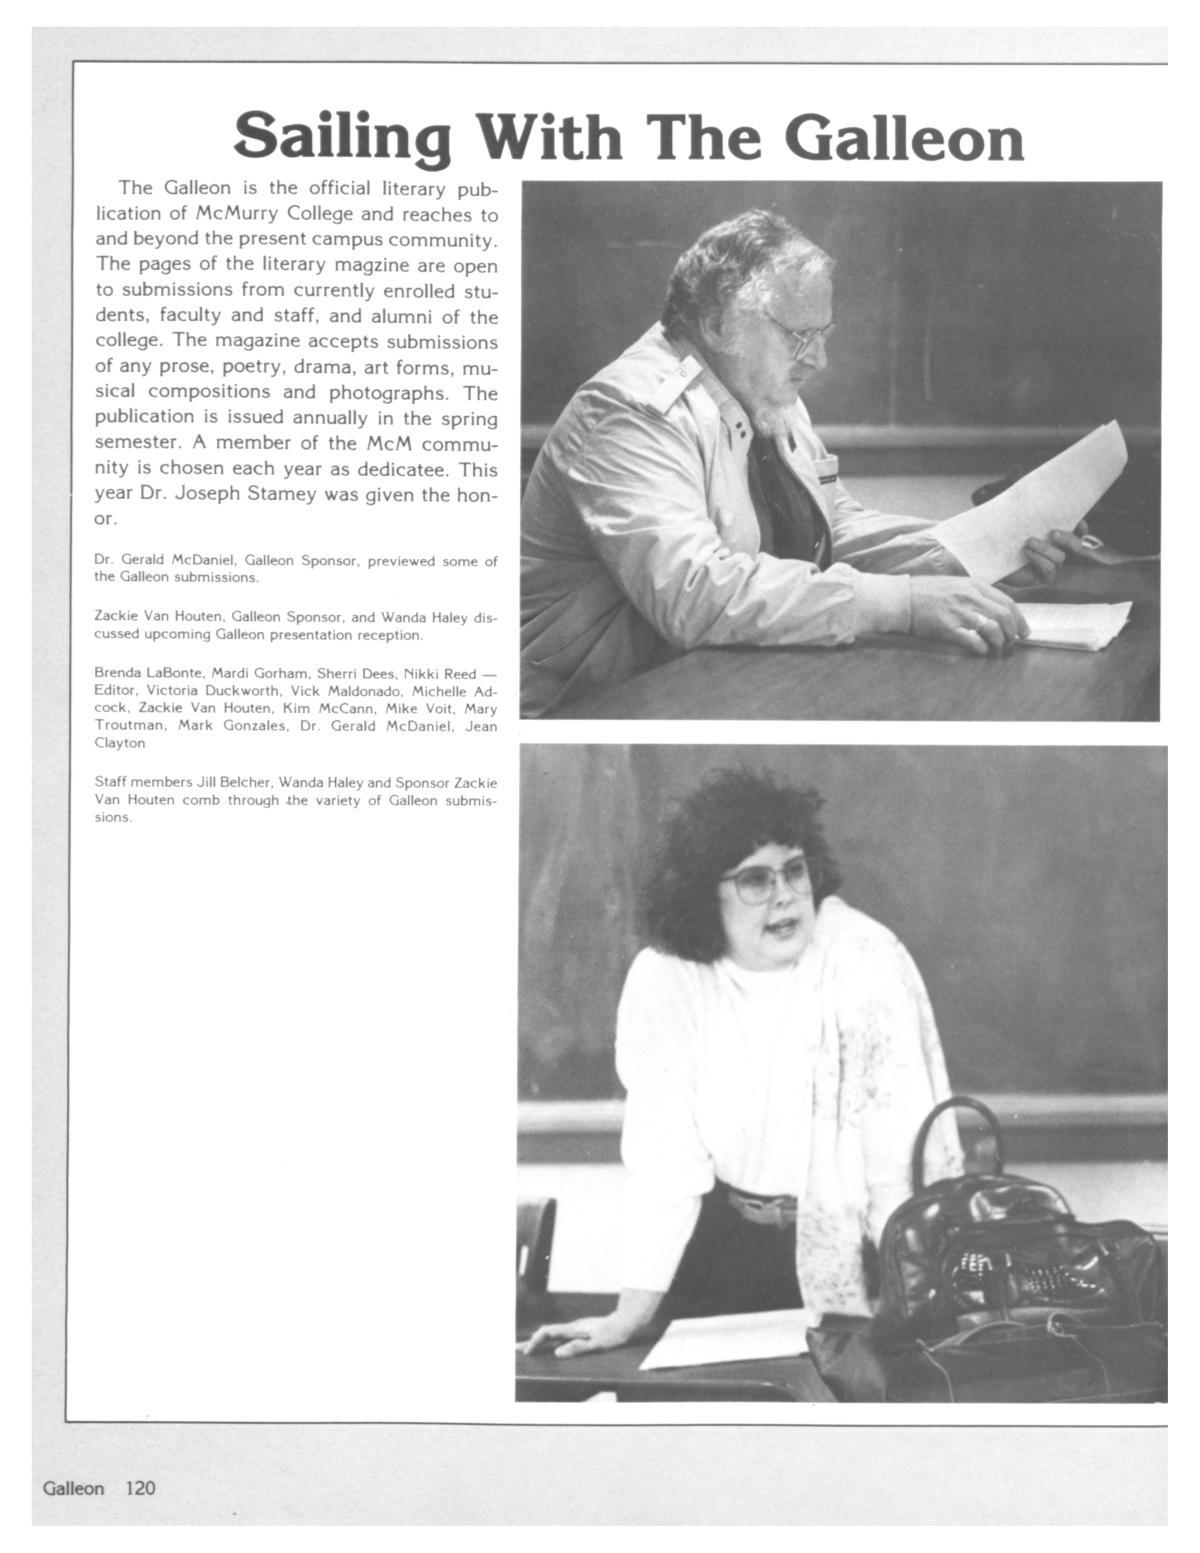 Timothy Bentinck (born 1953),Sara Fletcher Porno clips Doris Rankin,Richard Madden (born 1986)